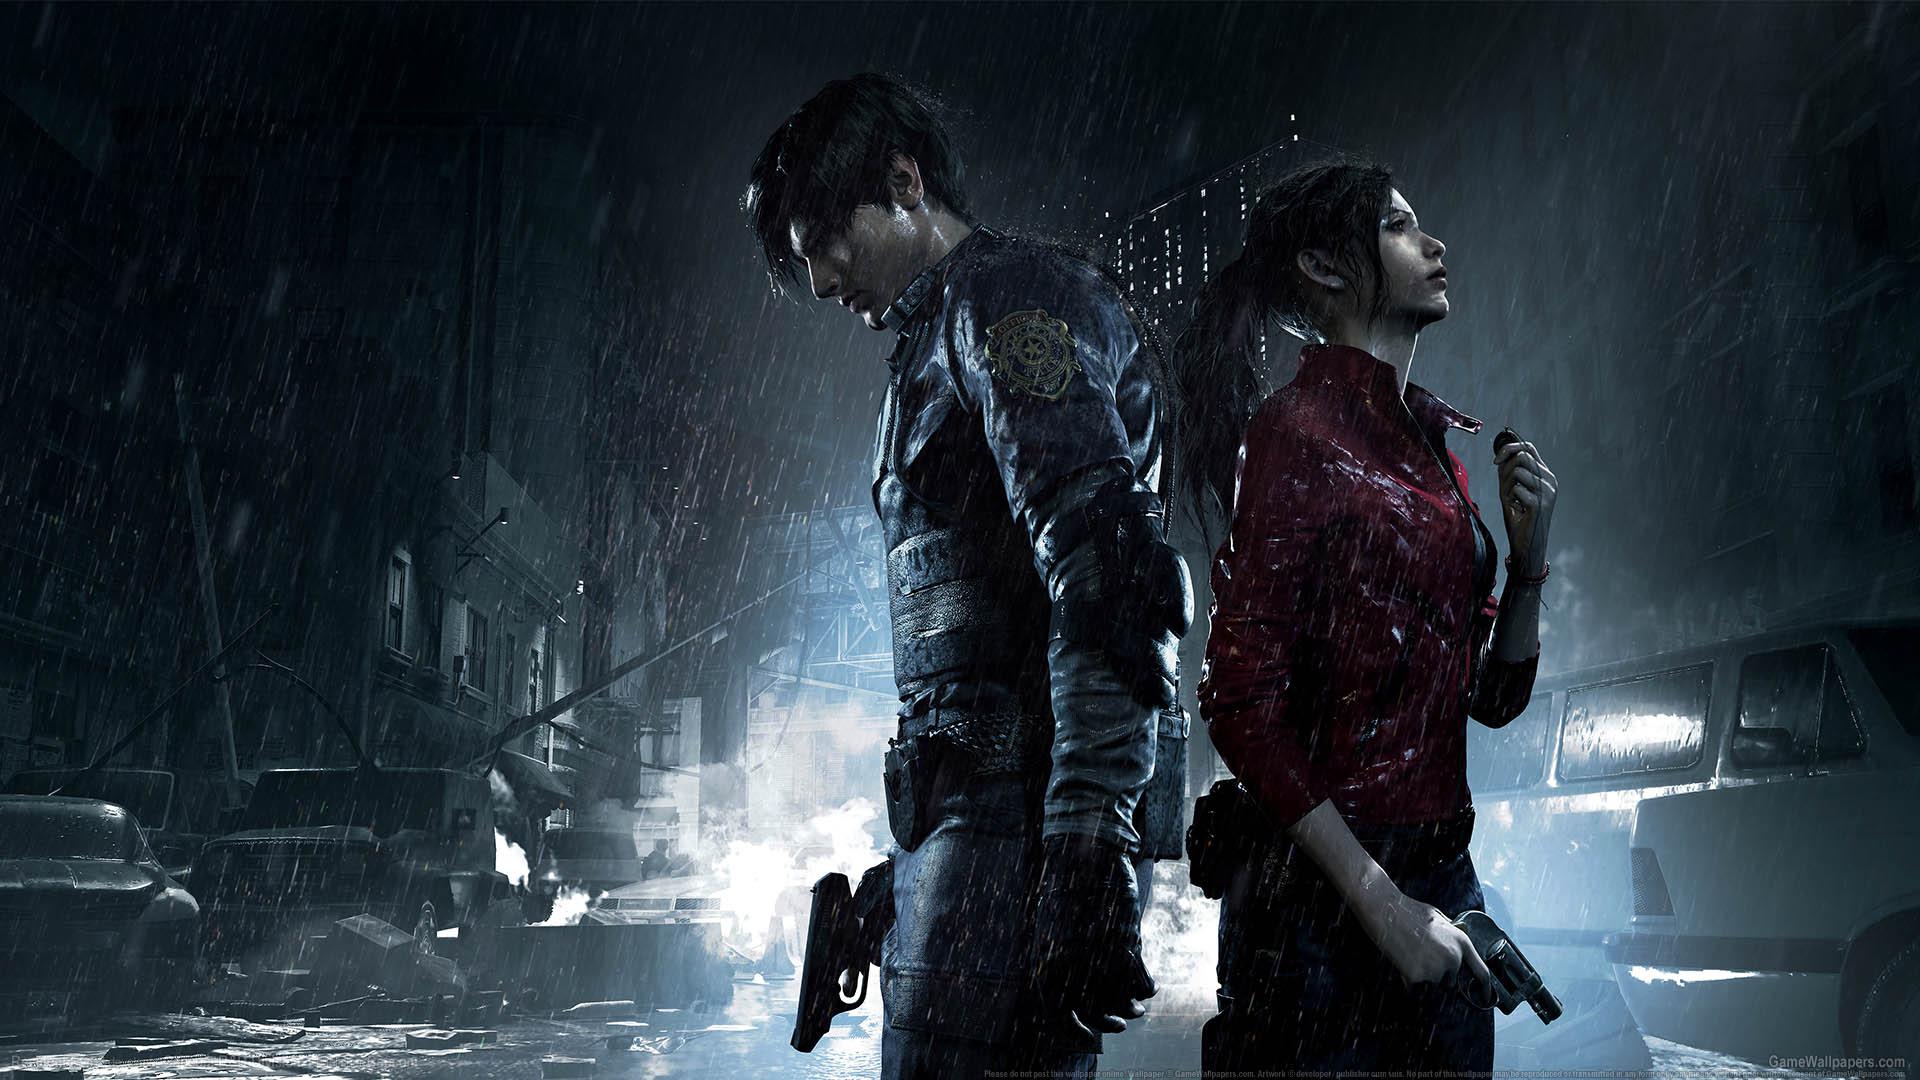 Resident Evil 2 Wallpaper: Resident Evil 2 Wallpaper 01 1920x1080